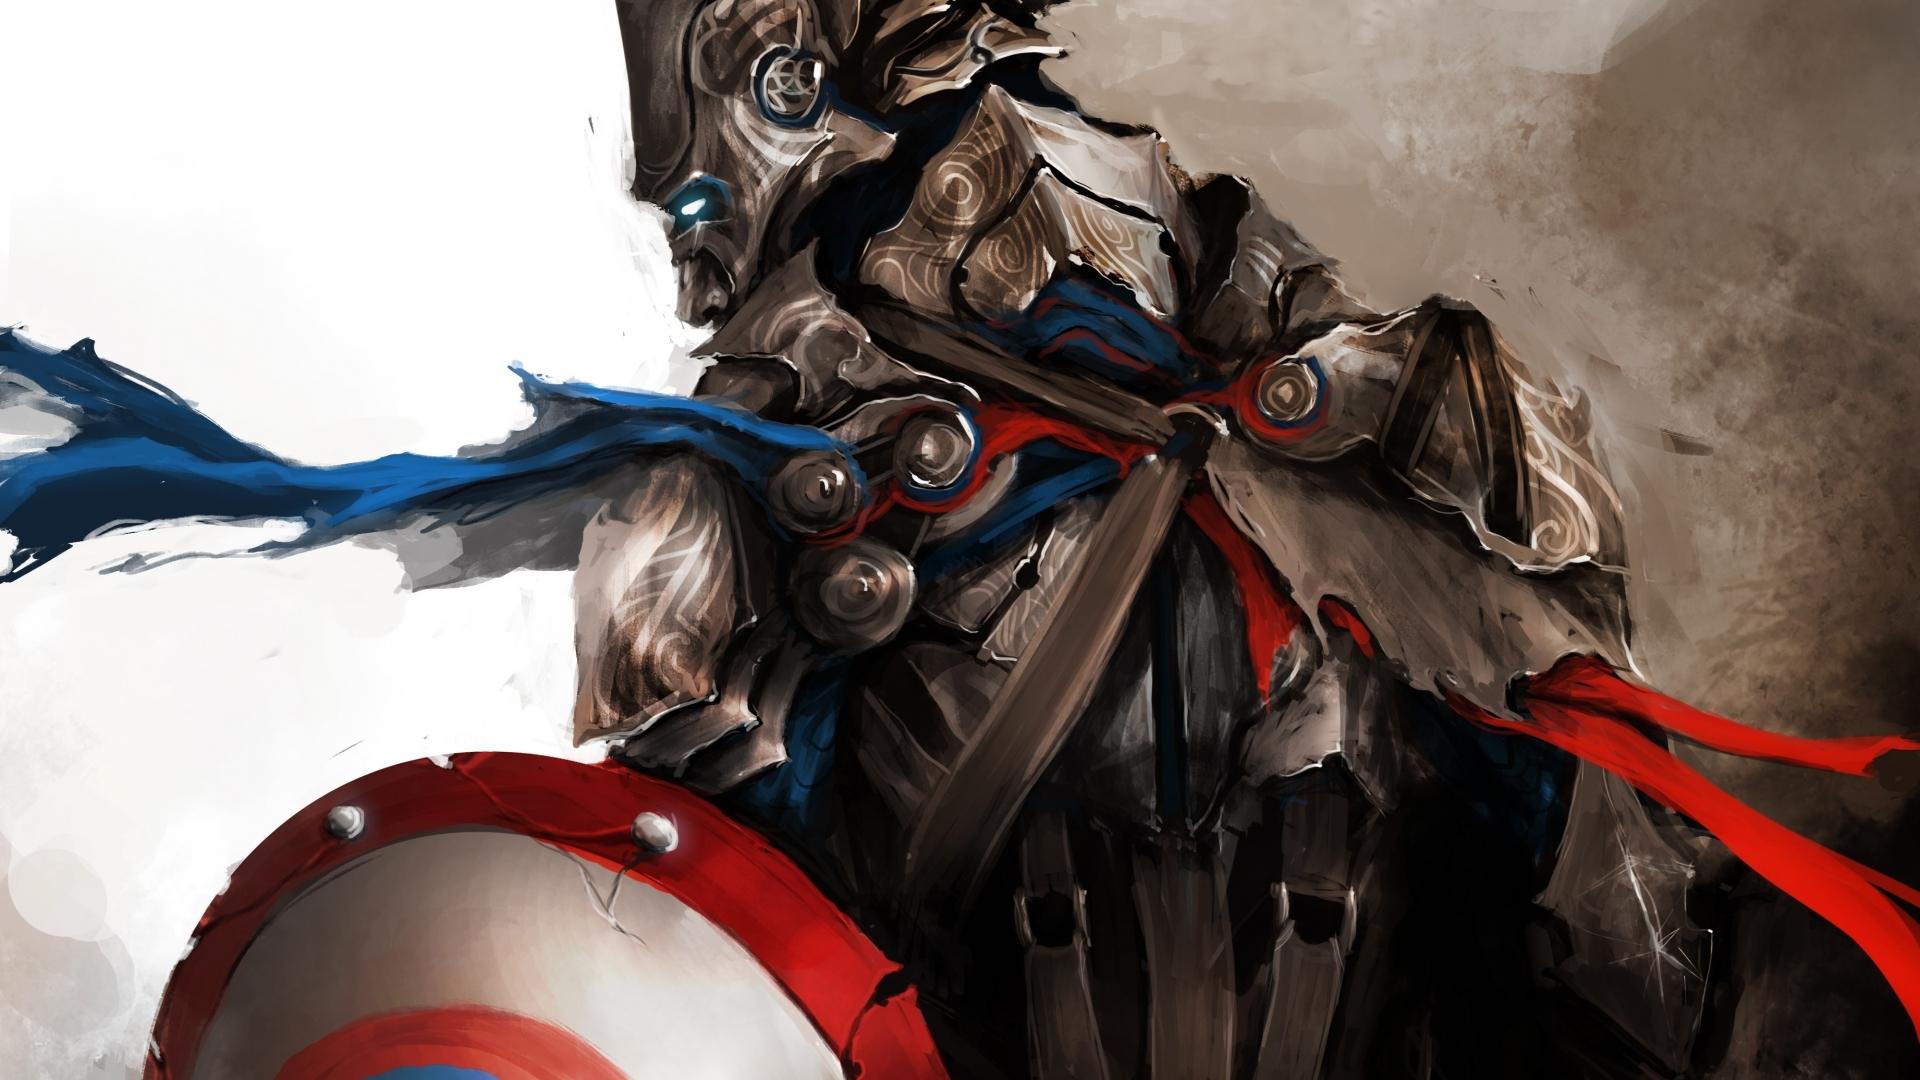 medieval captain america superhero wallpaper background 1920x1080